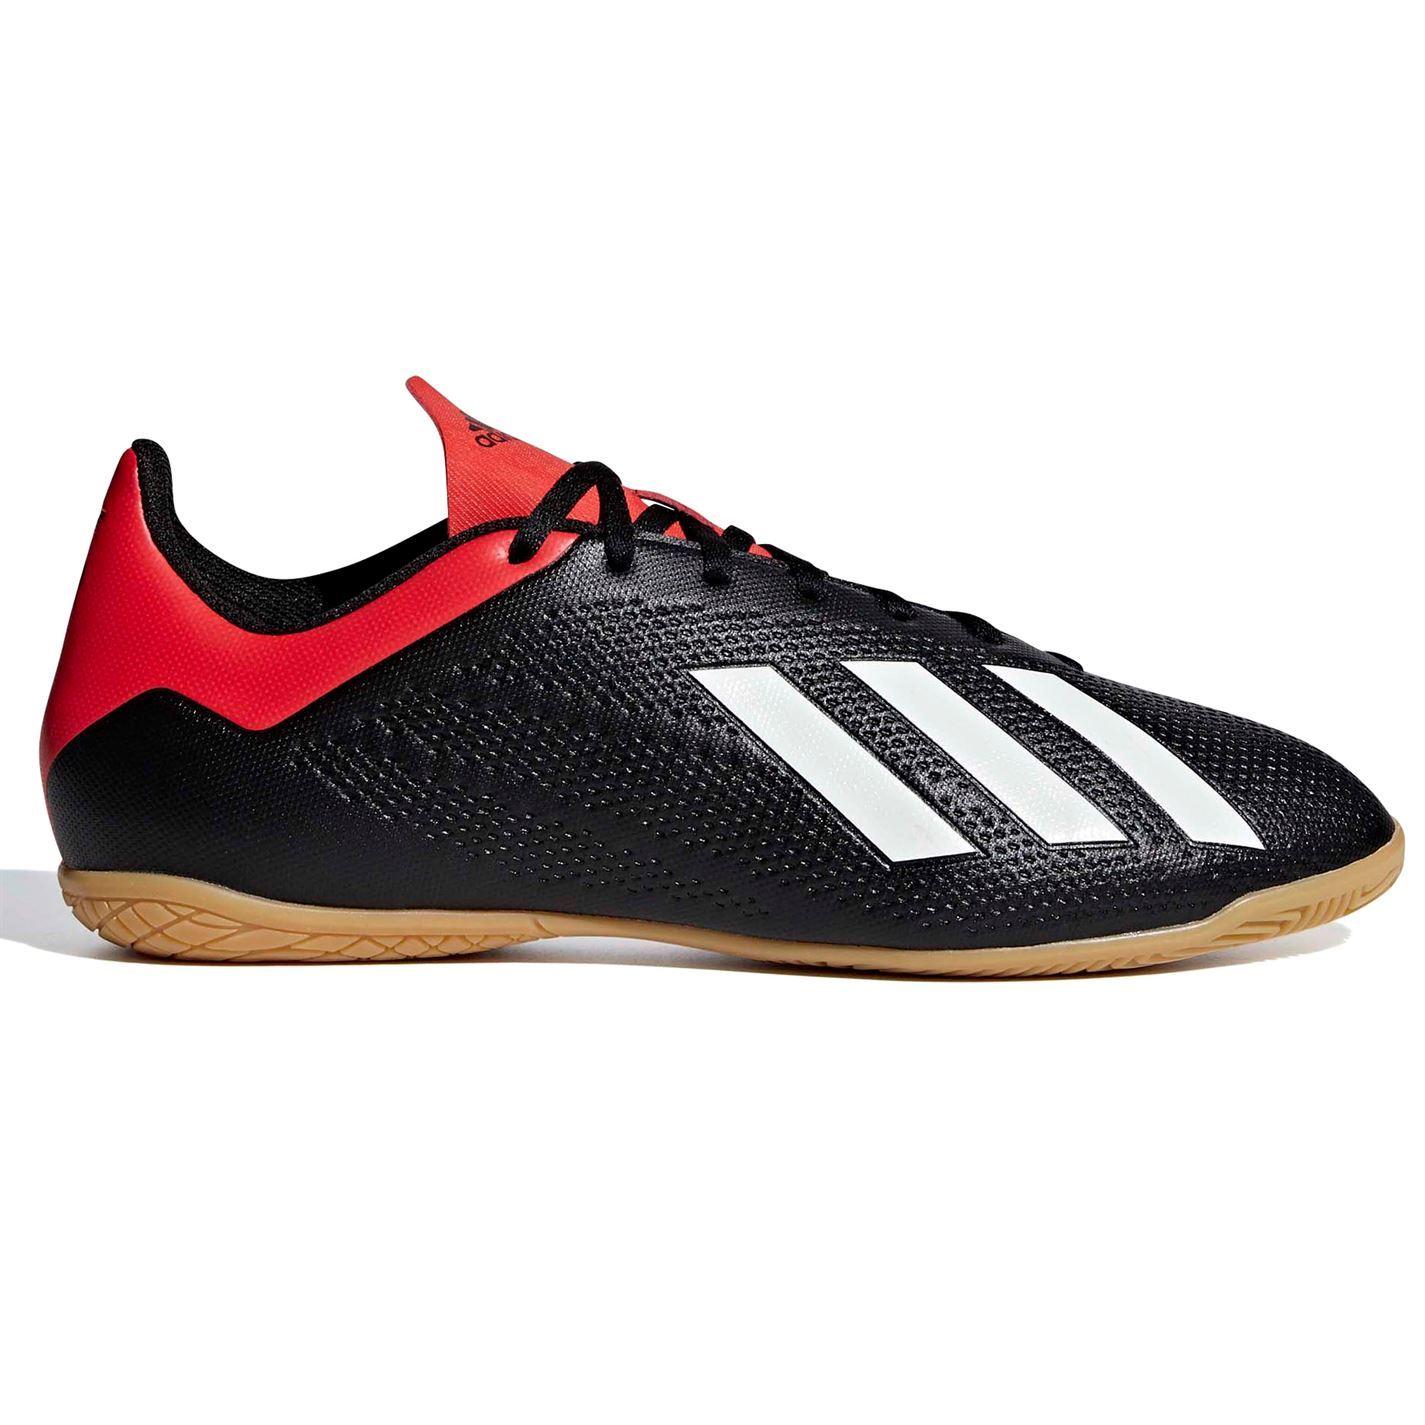 3e60da5c2cef adidas X Tango 18.4 Indoor Football Trainers Mens Soccer Futsal ...